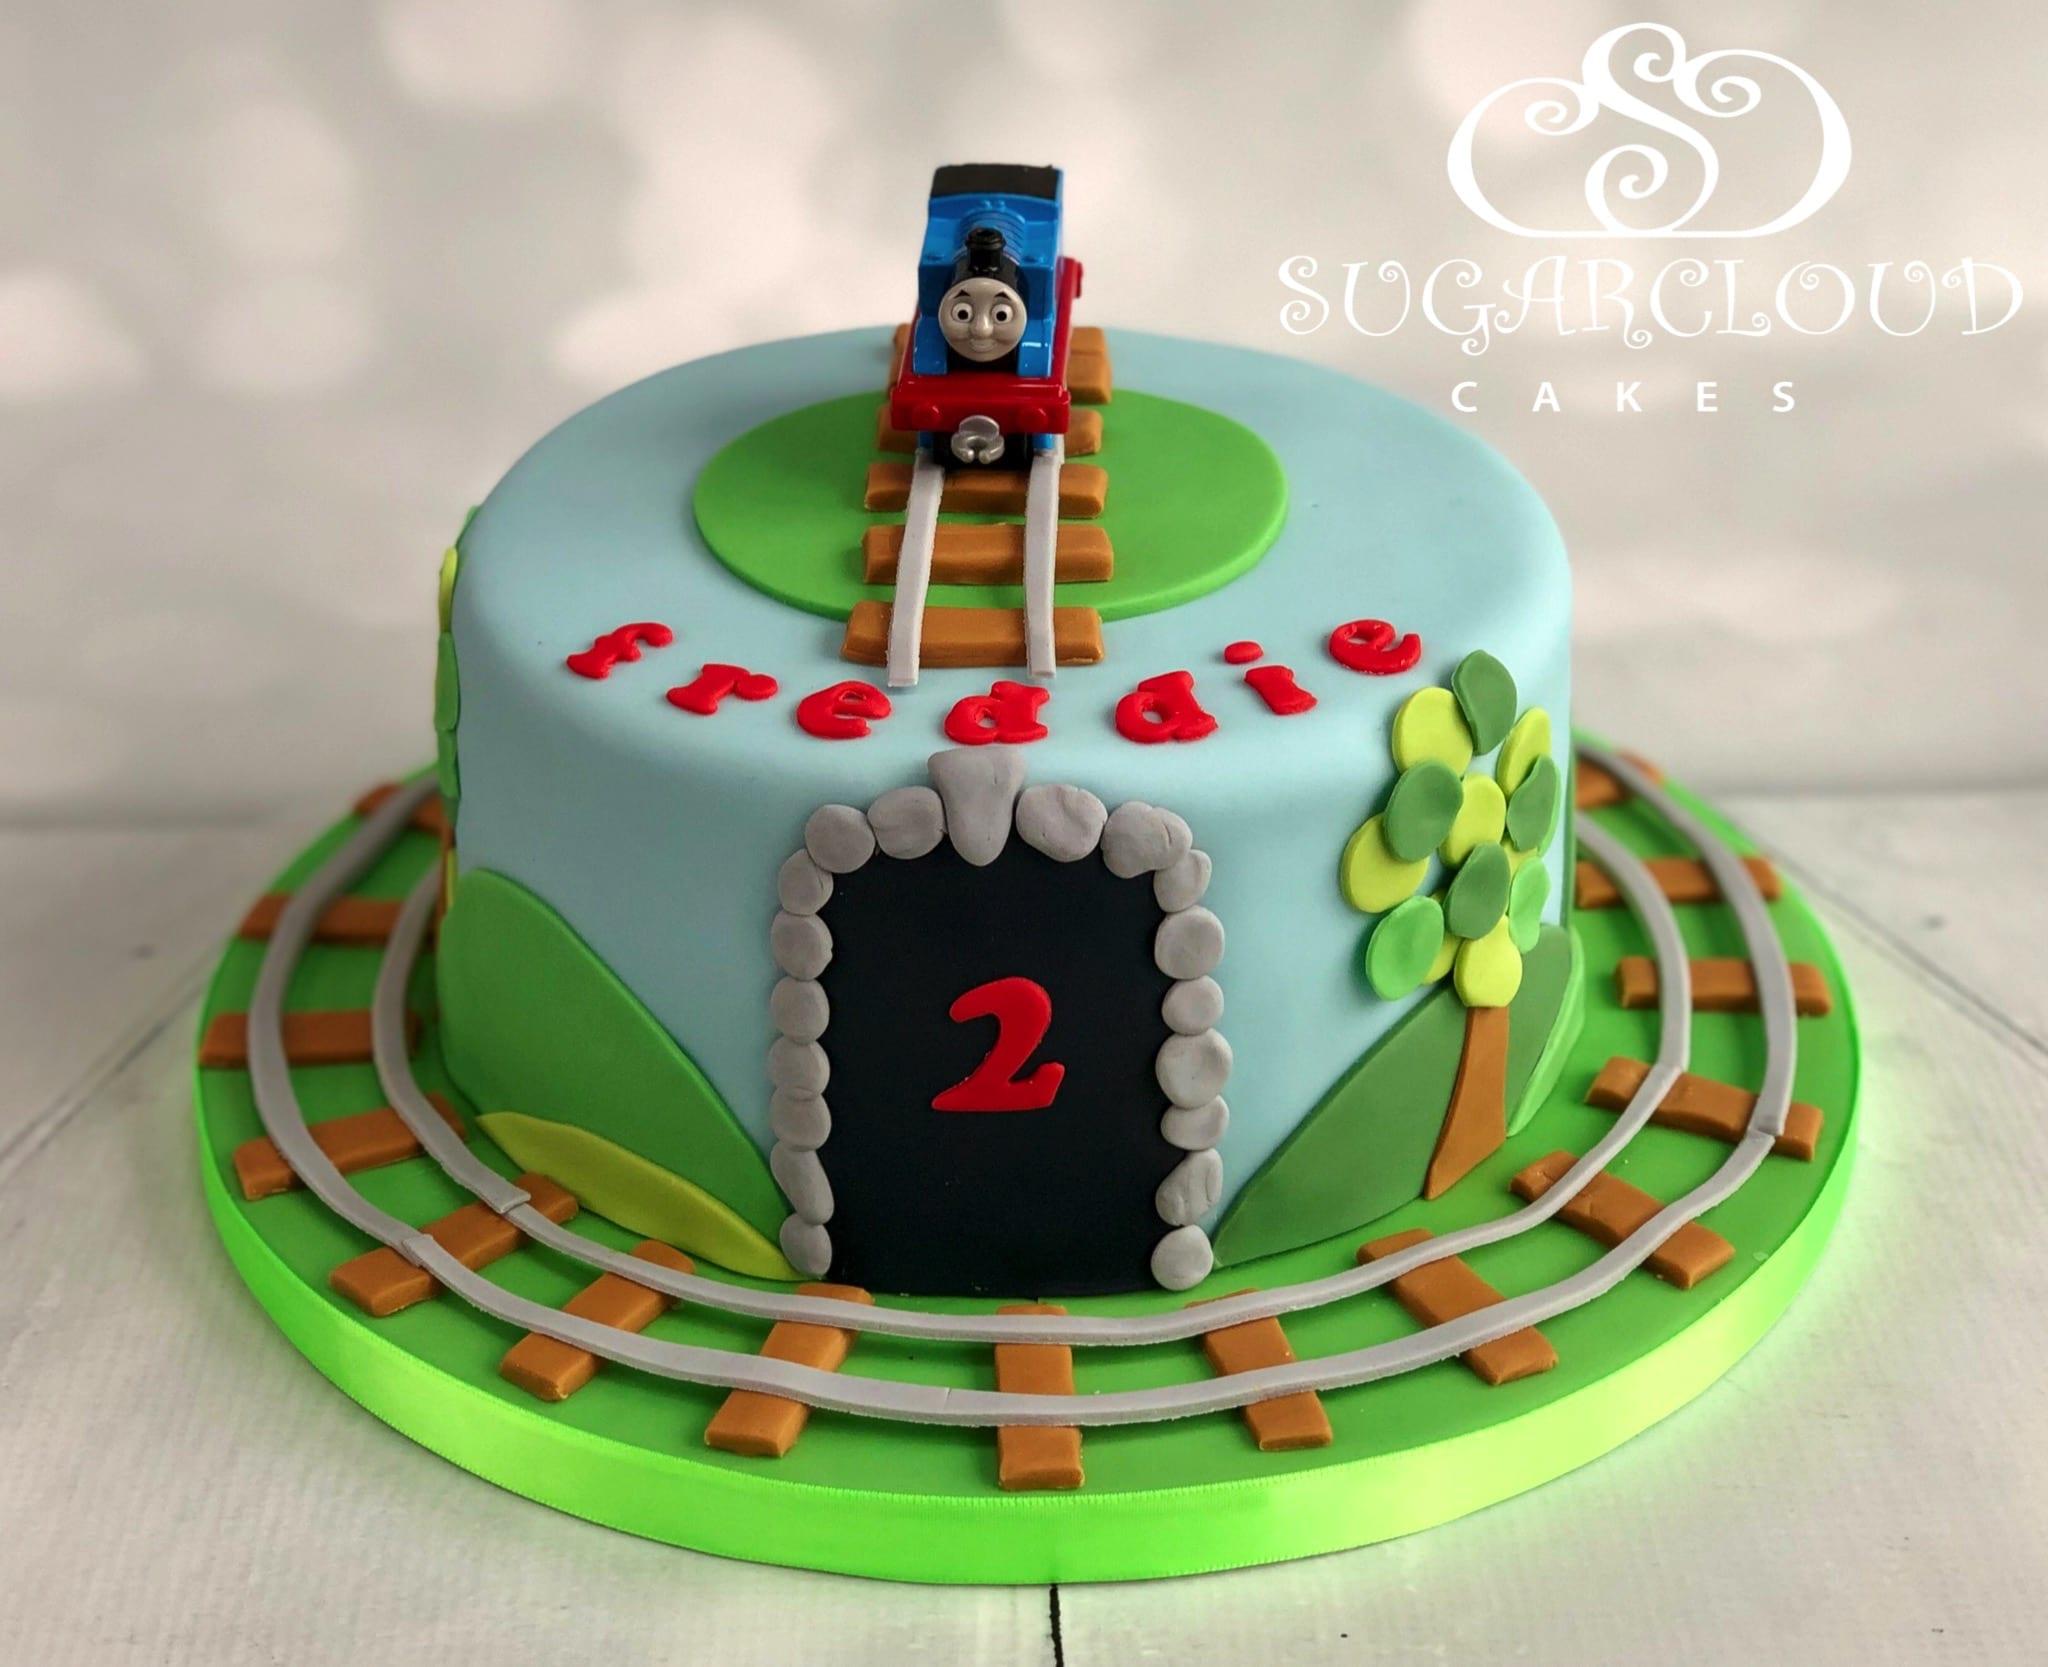 A Thomas The Tank Engine Themed 2nd Birthday Cake